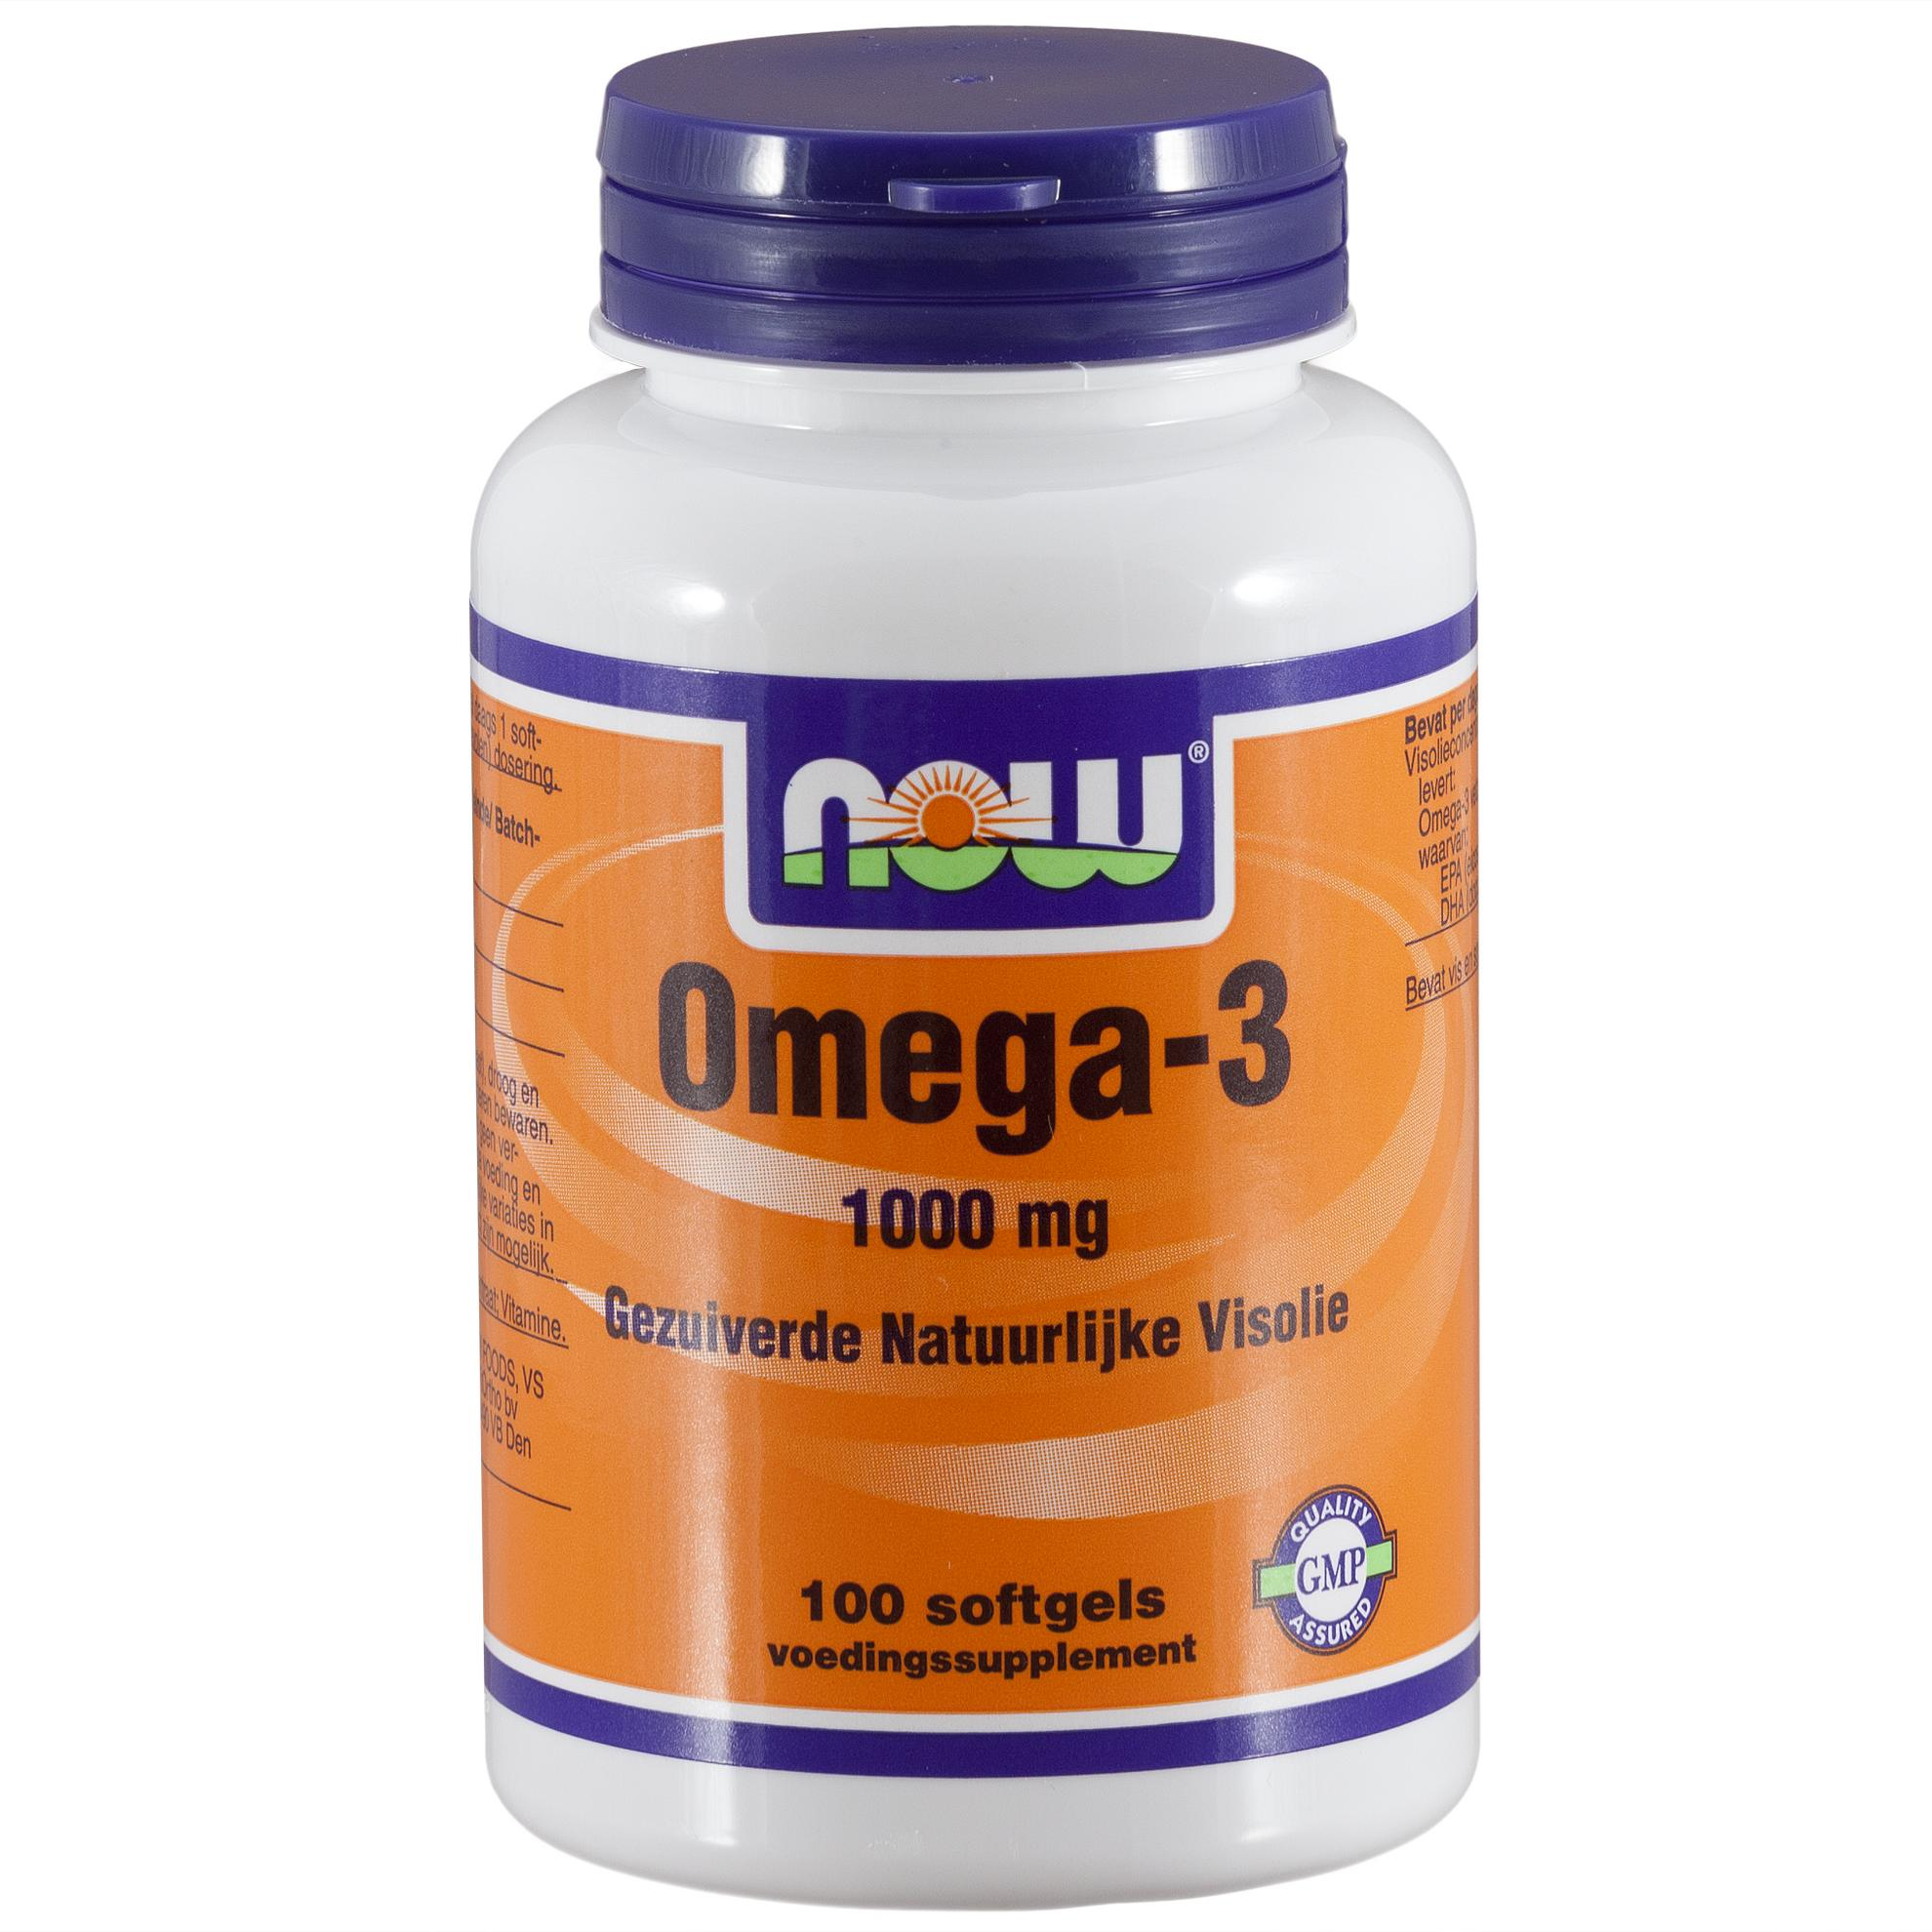 Omega-3 1000 mg (100 softgels) – Now Foods